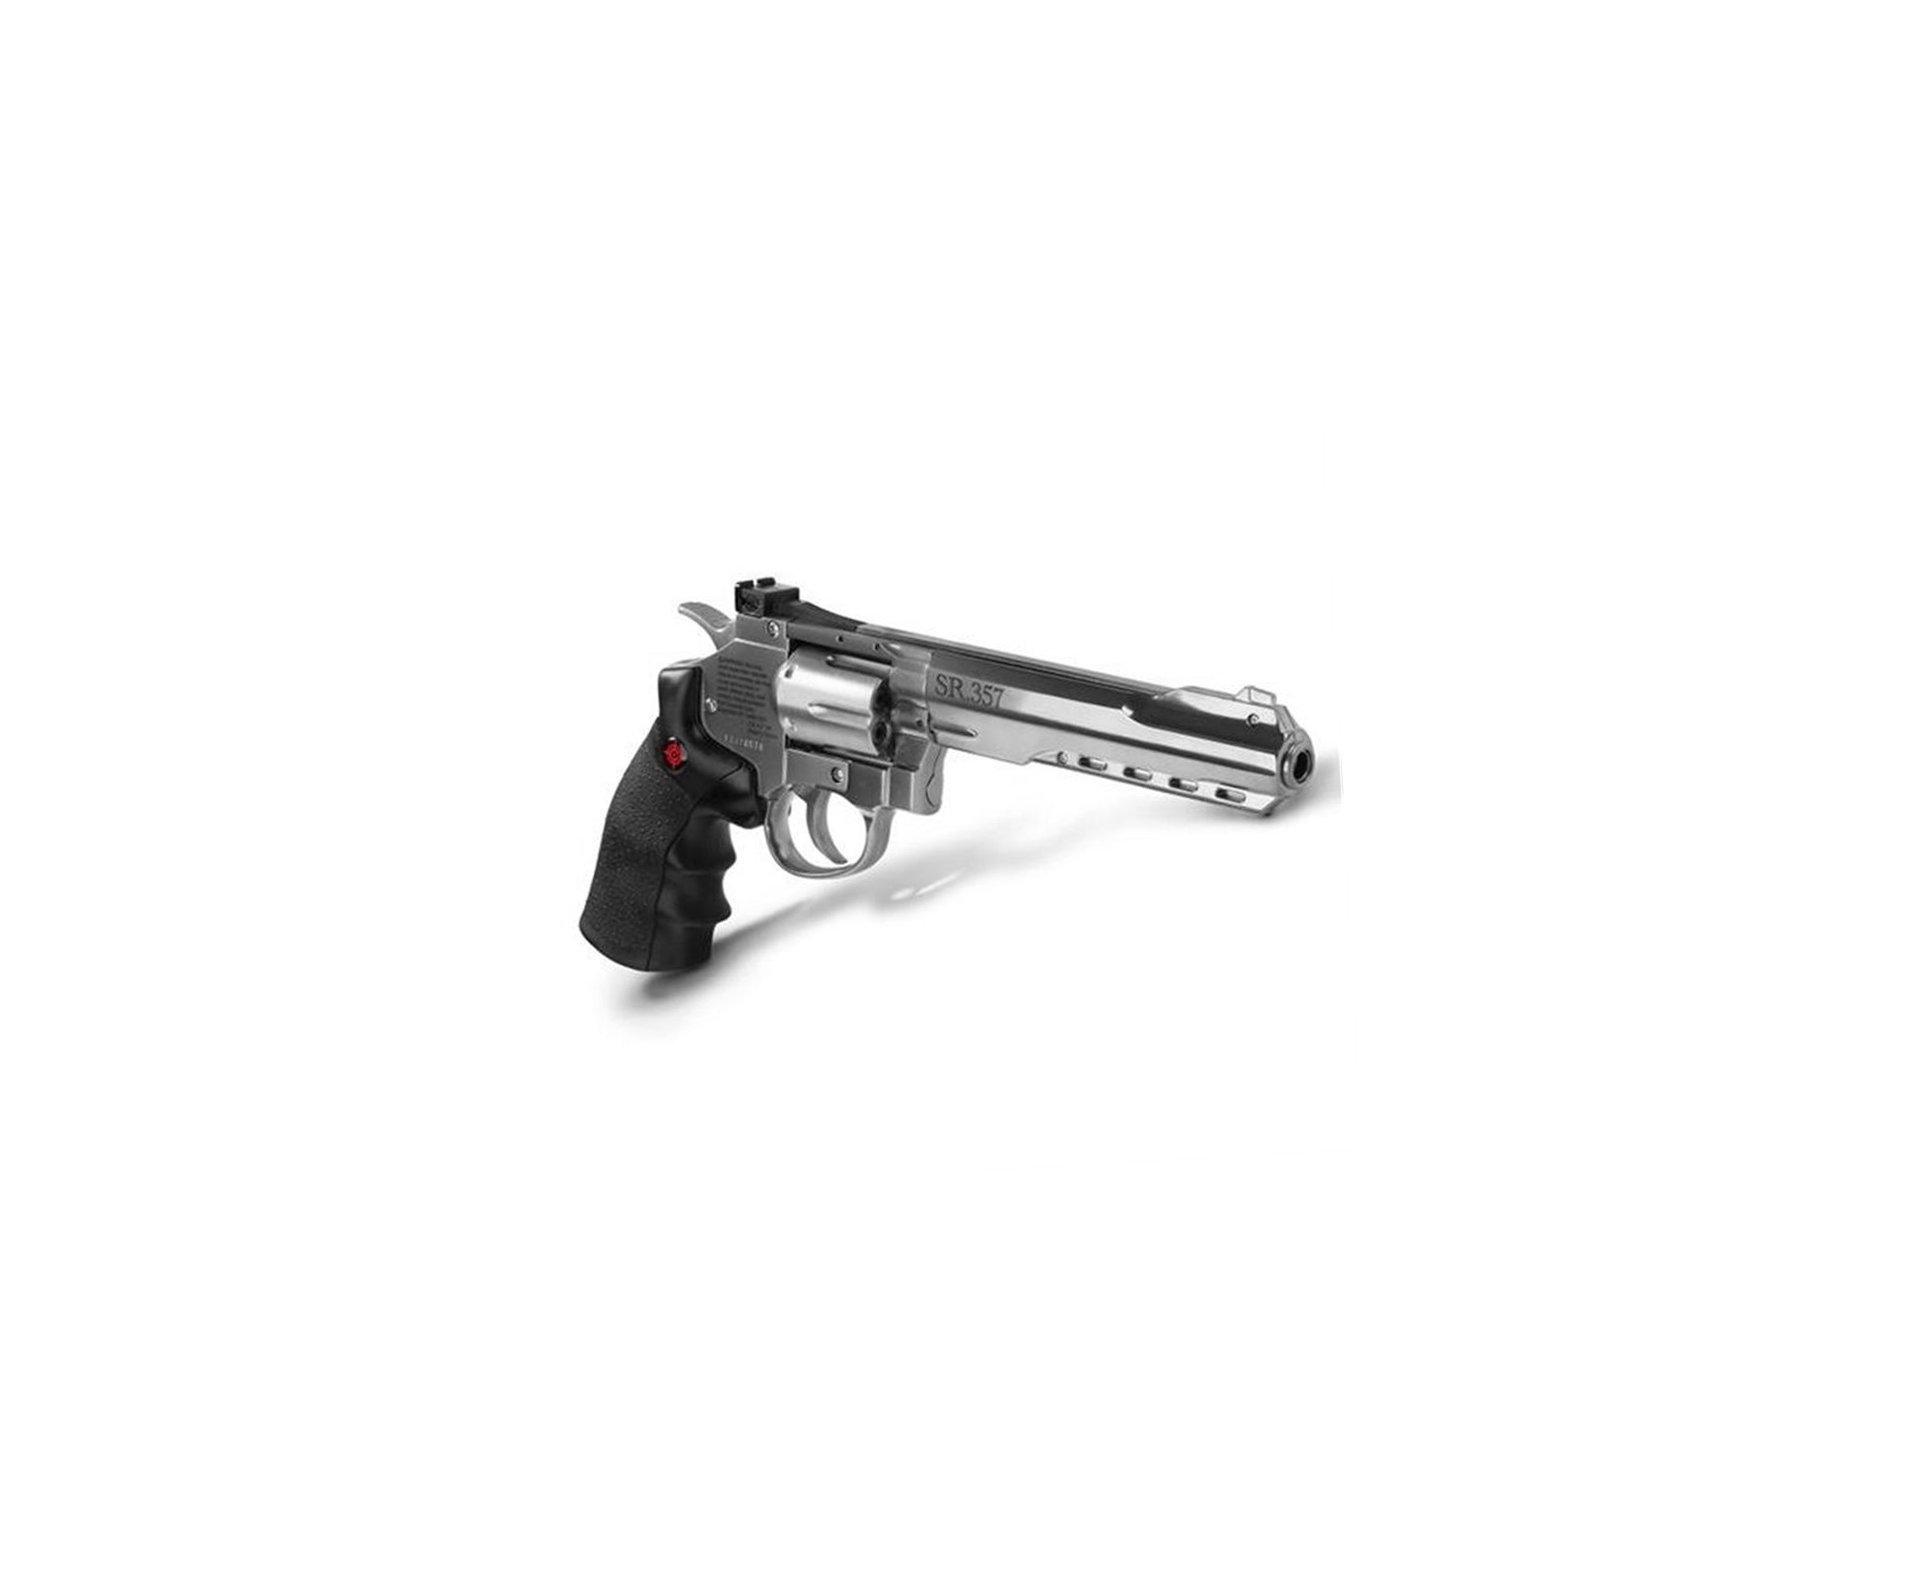 "Revolver De Pressão Gas Co2 Sr357 Silver 6"" Full Metal 6 Tiros 4,5mm Crosman"